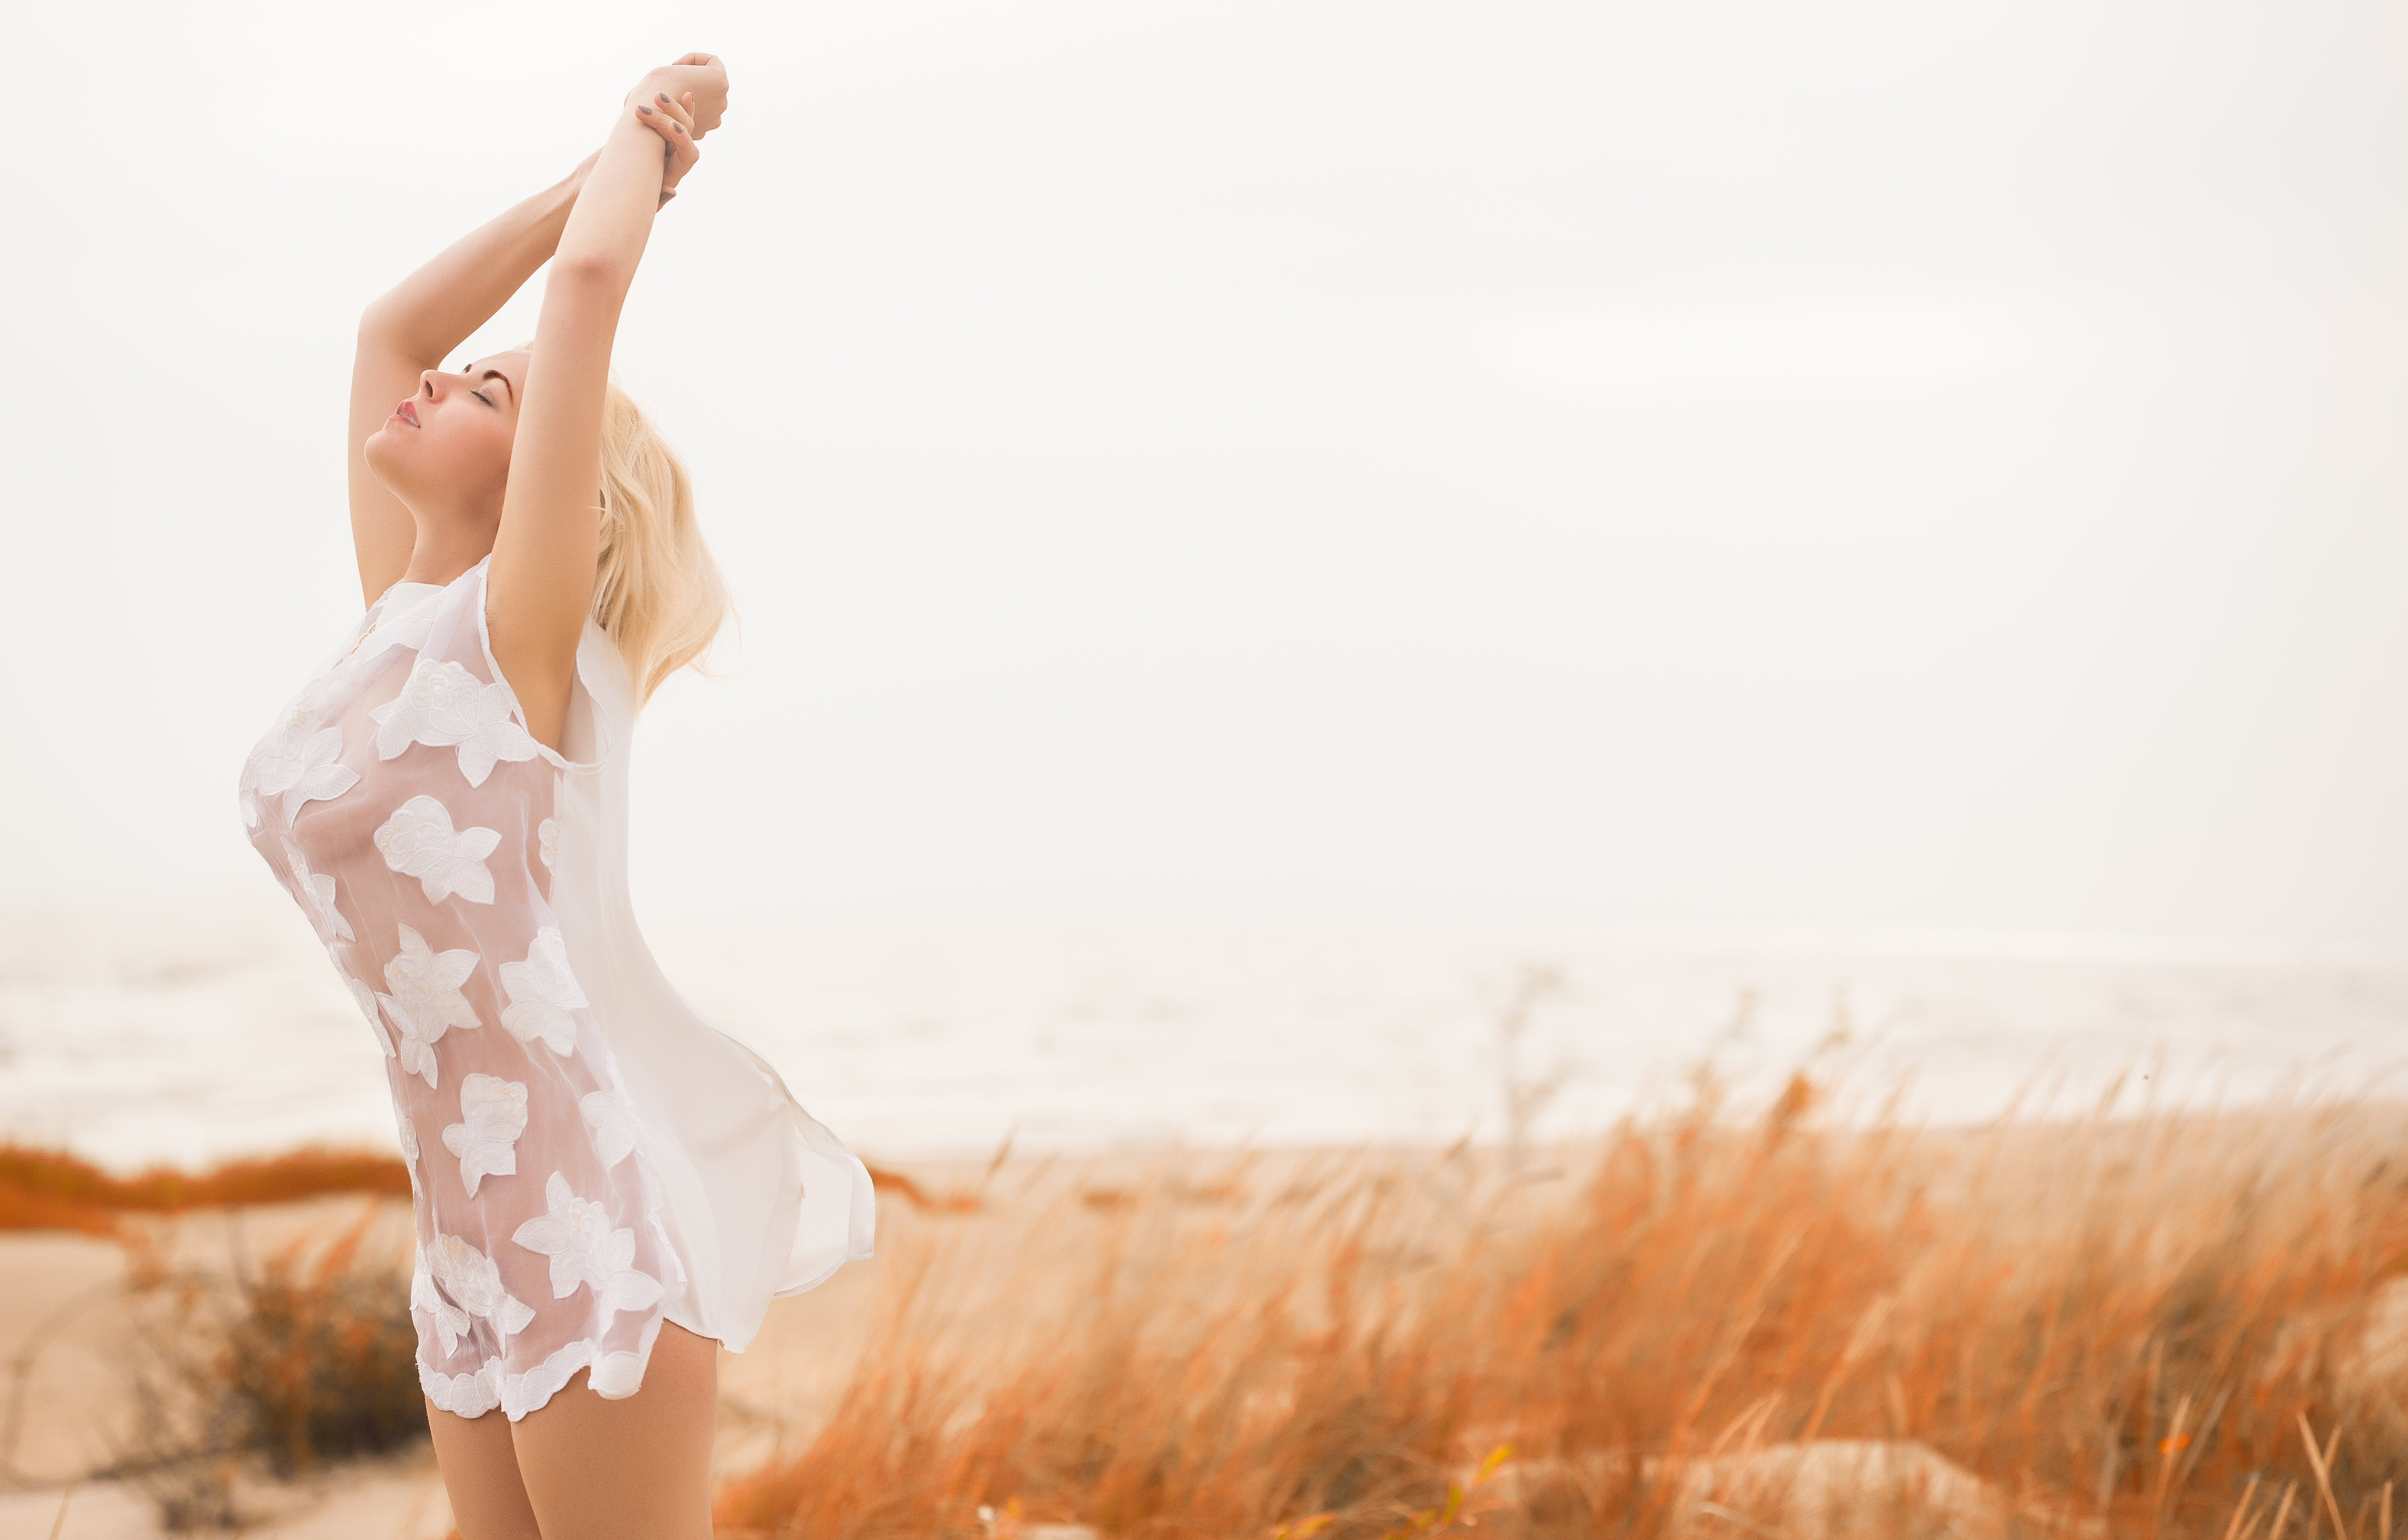 Woman Wearing Sheer Dress Standing Near Grasses